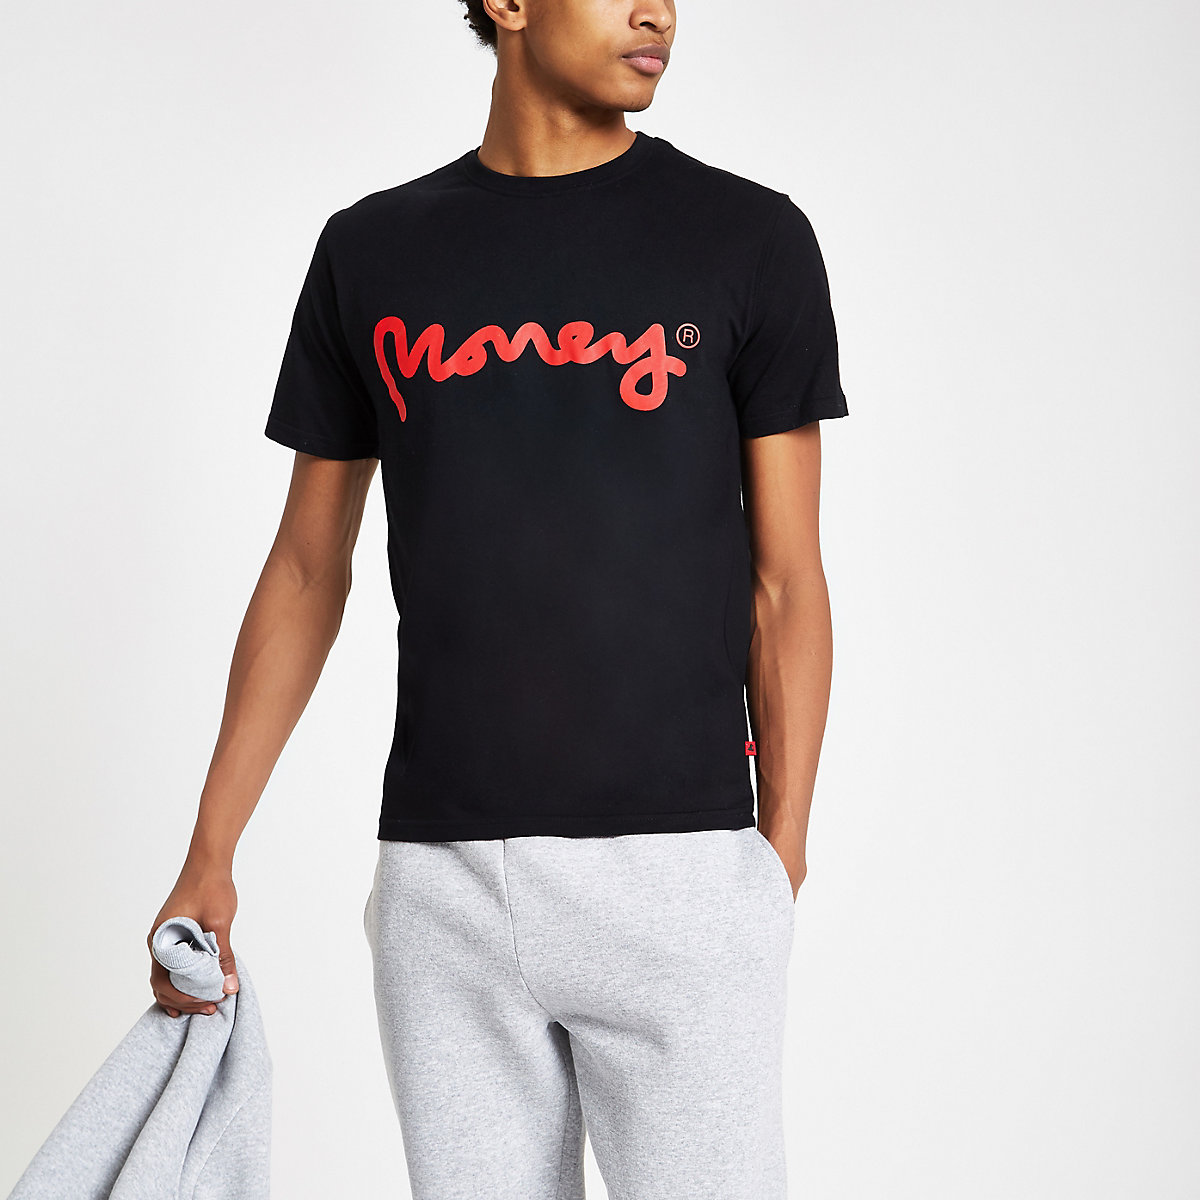 Money Clothing black logo print T-shirt